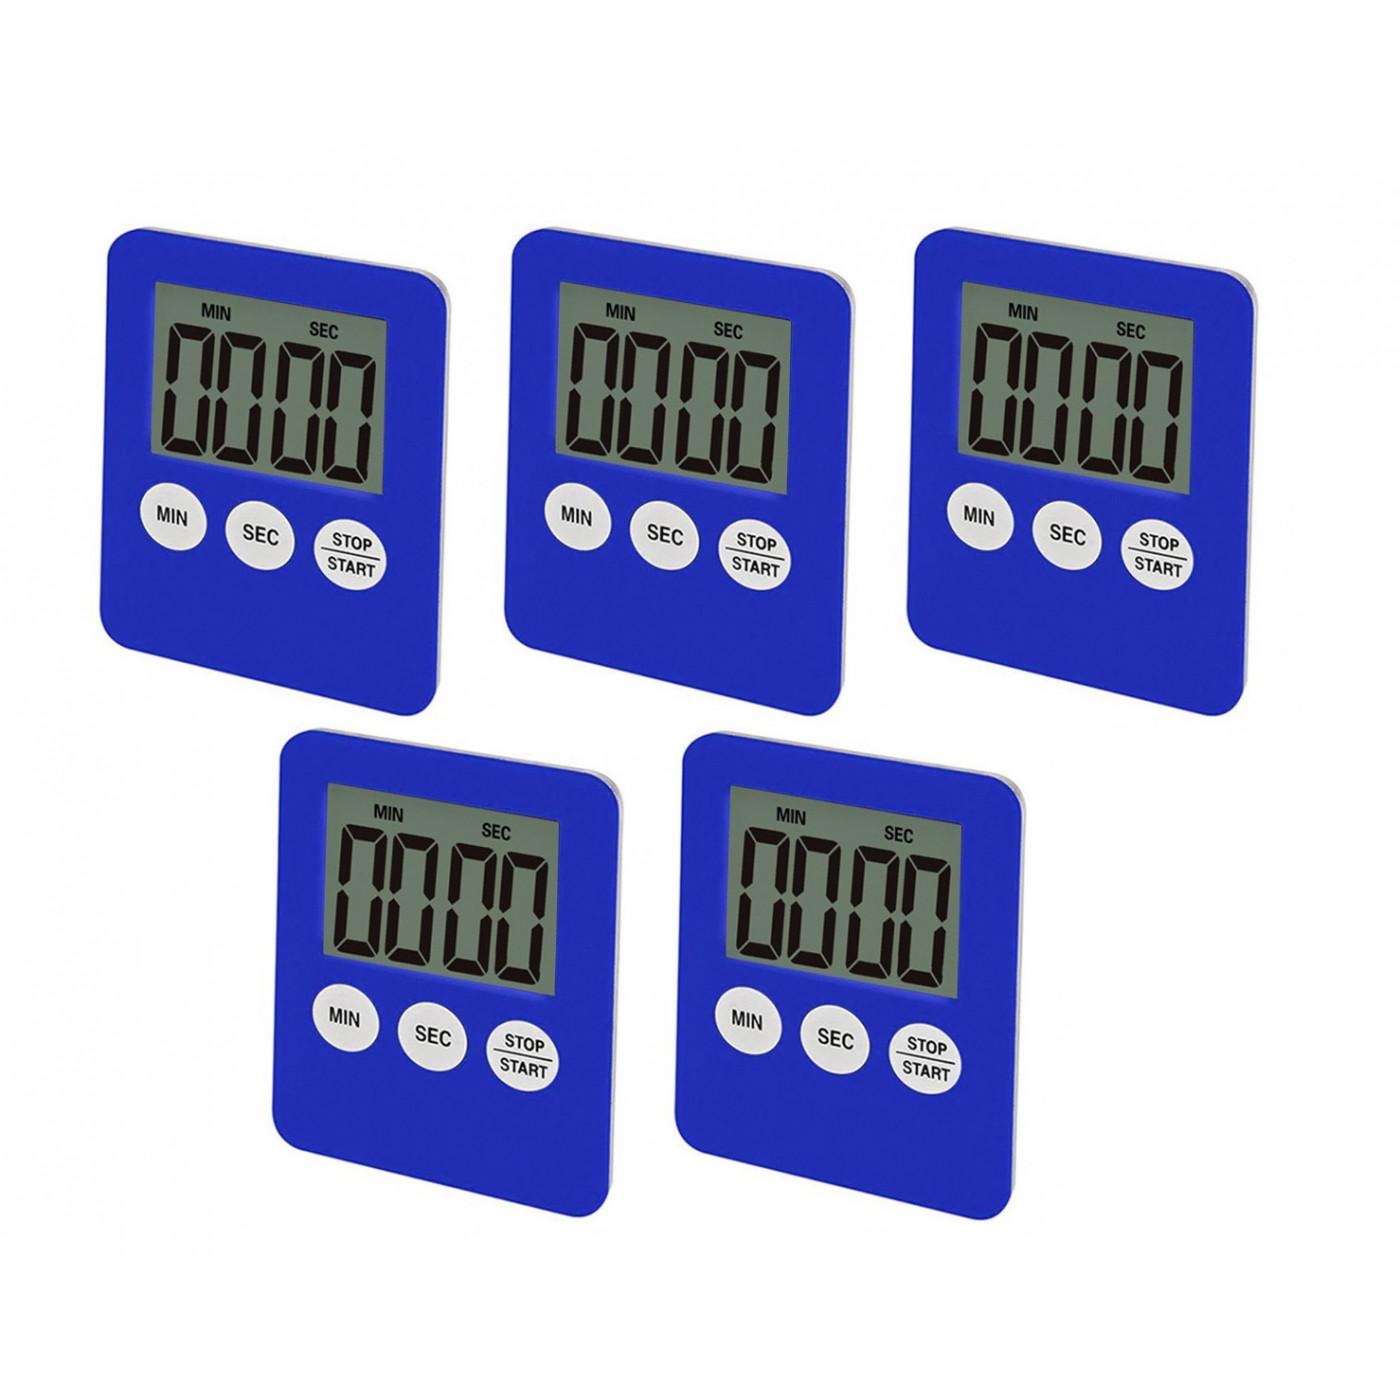 Conjunto de 5 temporizadores digitales, despertadores, azul  - 1